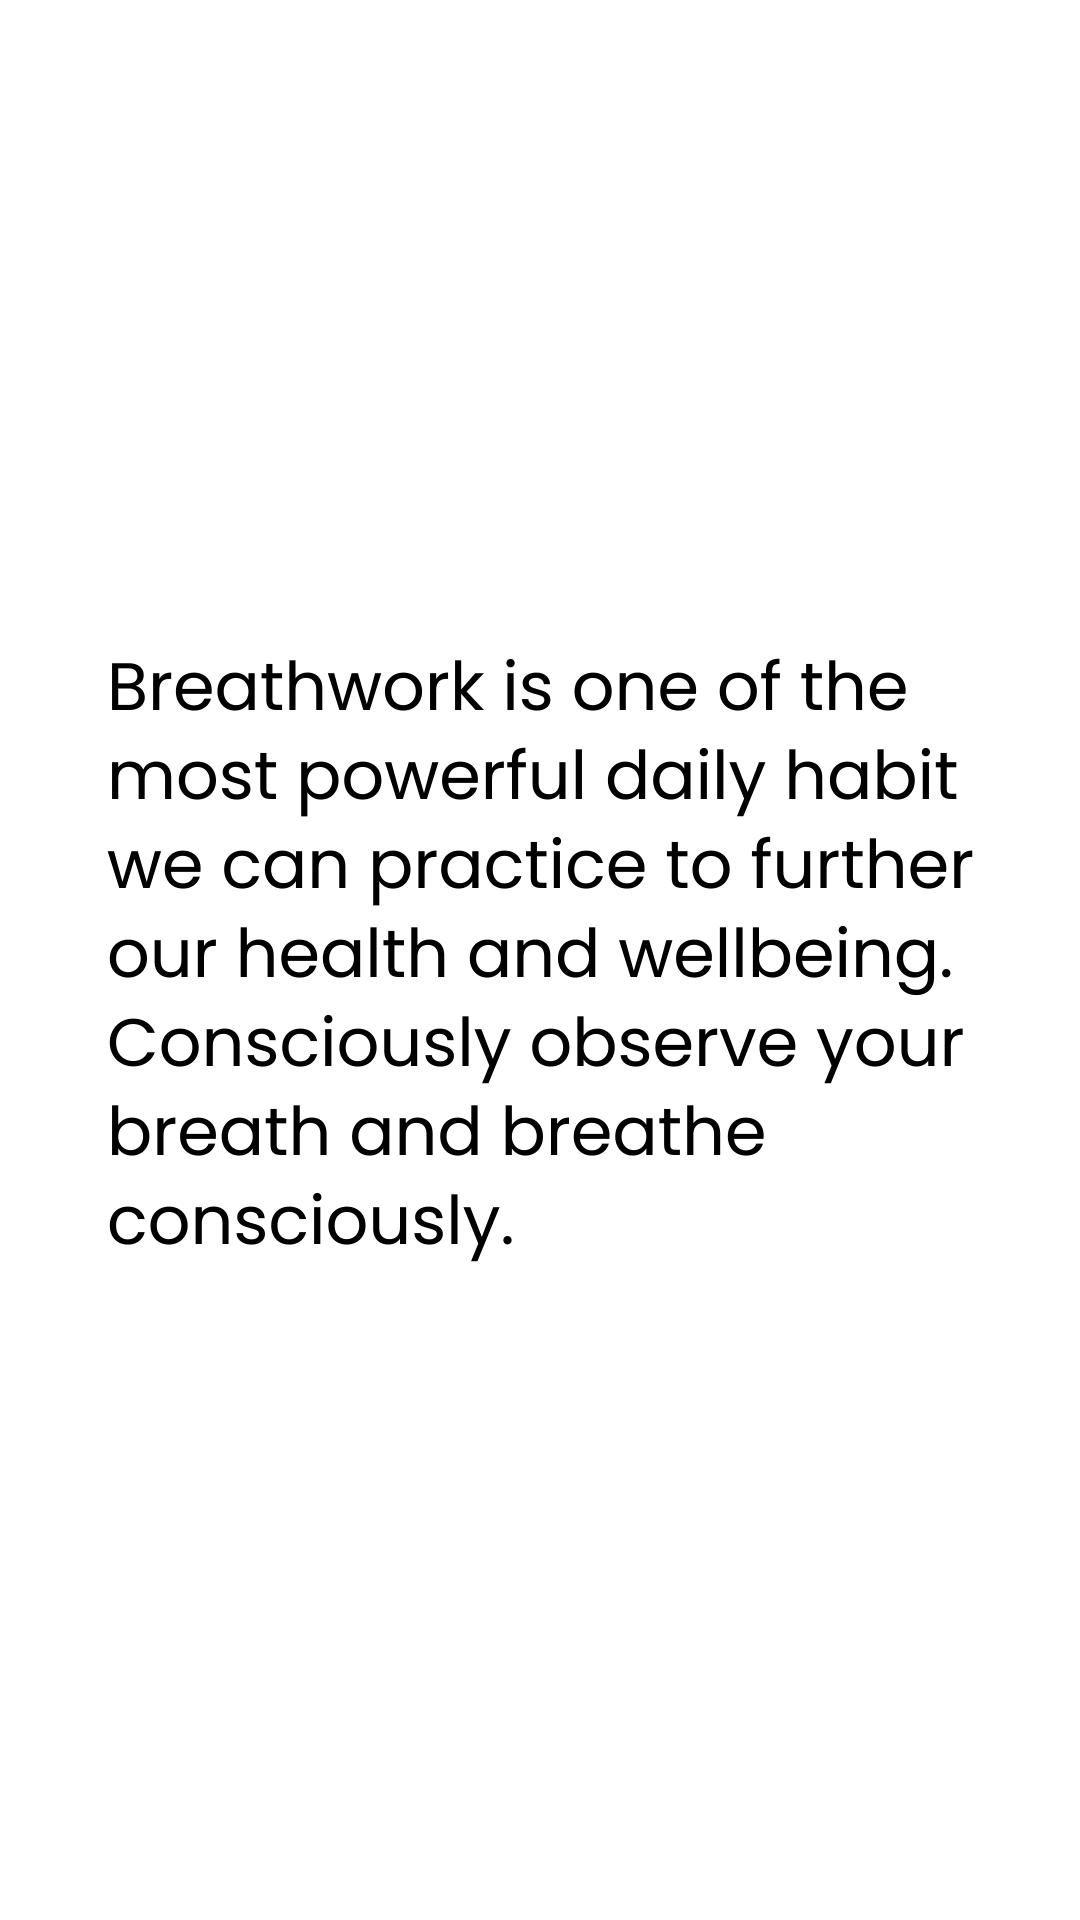 Make Breathwork a daily habit